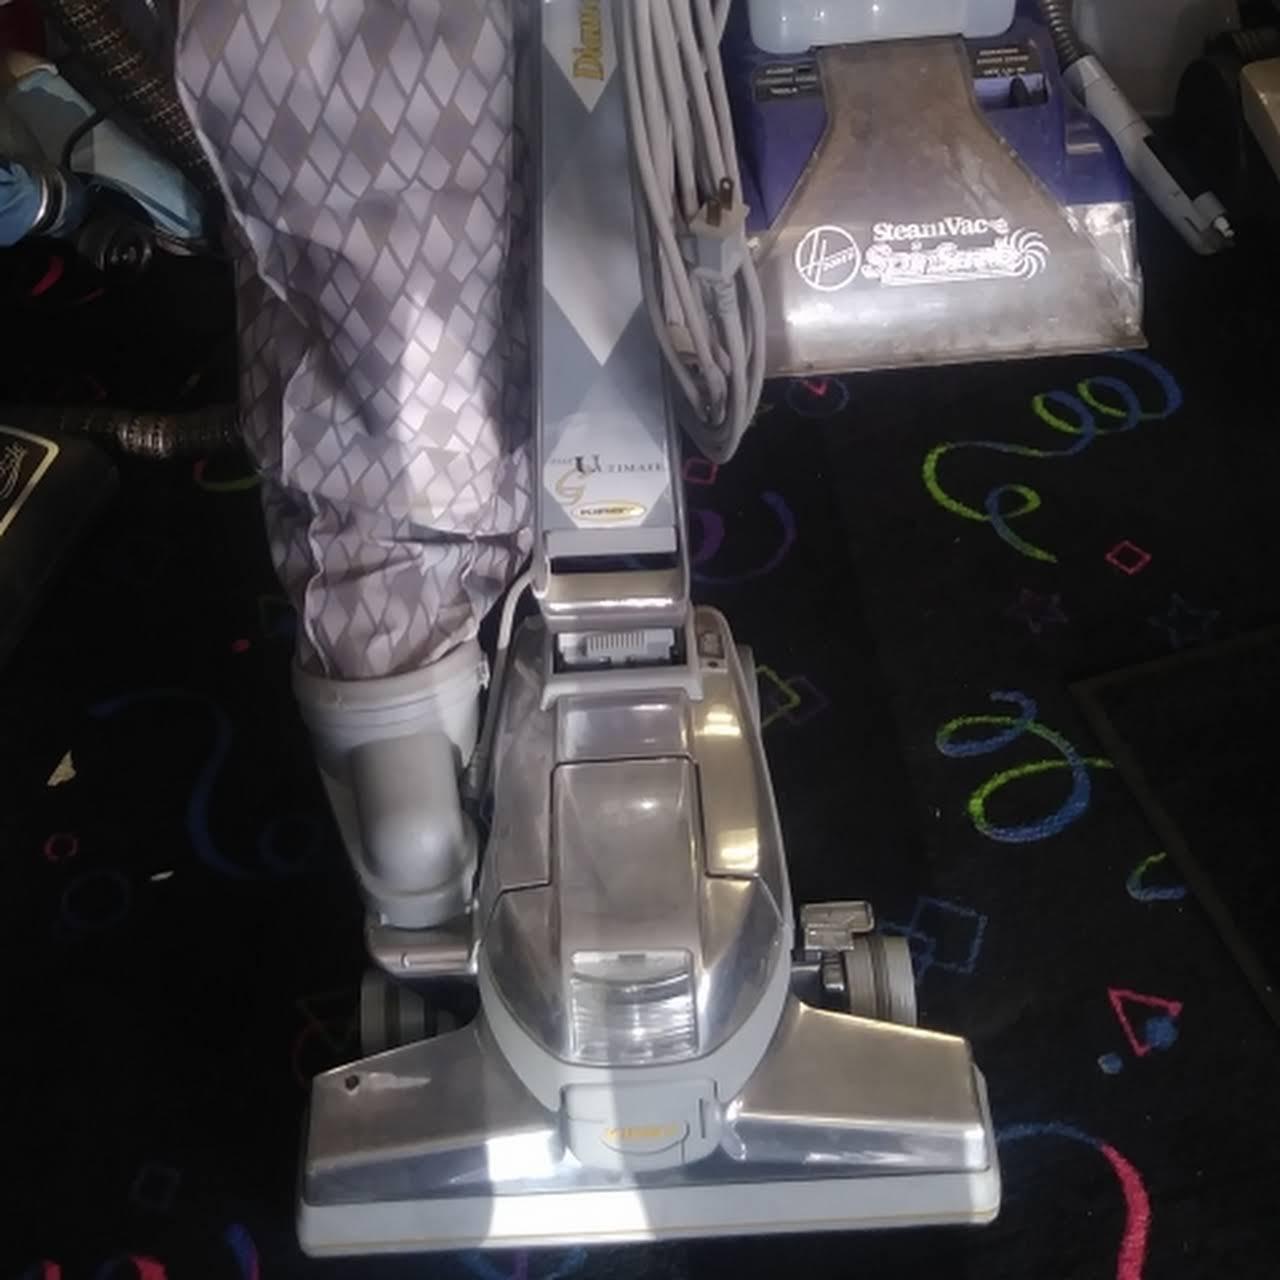 6adfe61adf1907 Vacuum   Sewing Dr Modesto - vacuum cleaner sewing machine repair ...